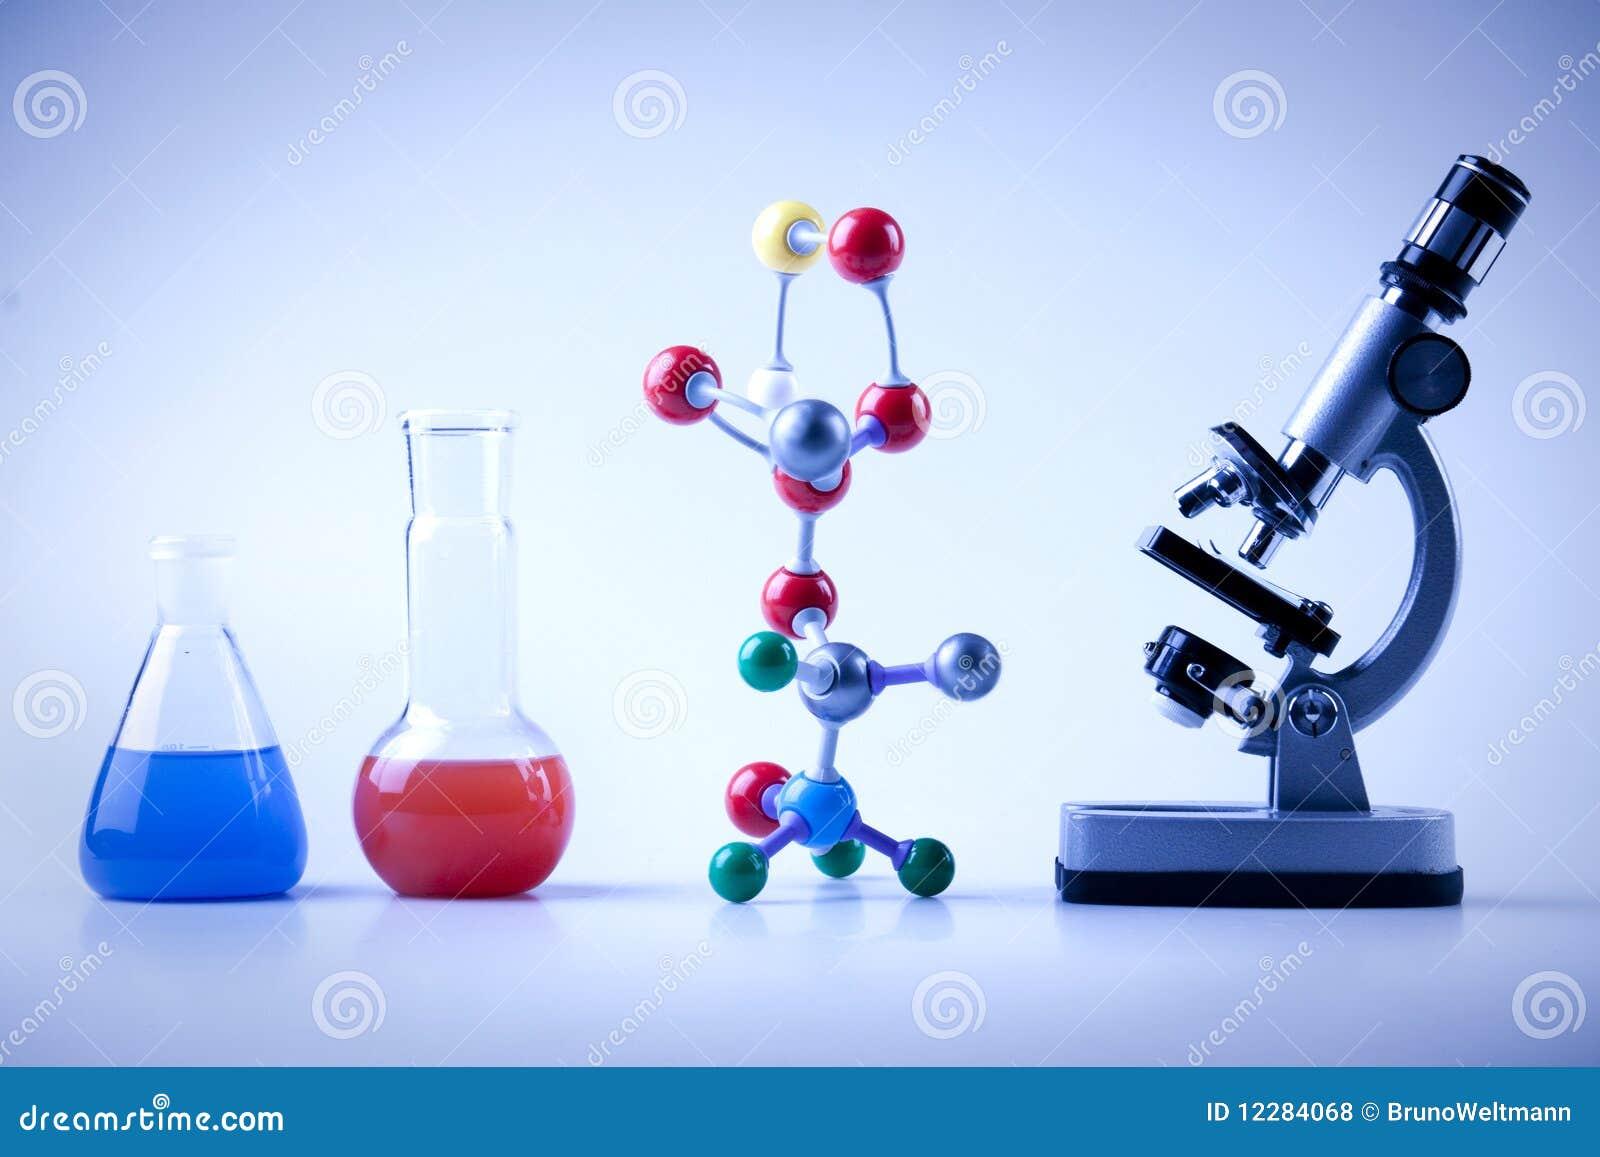 De Apparatuur van de chemie